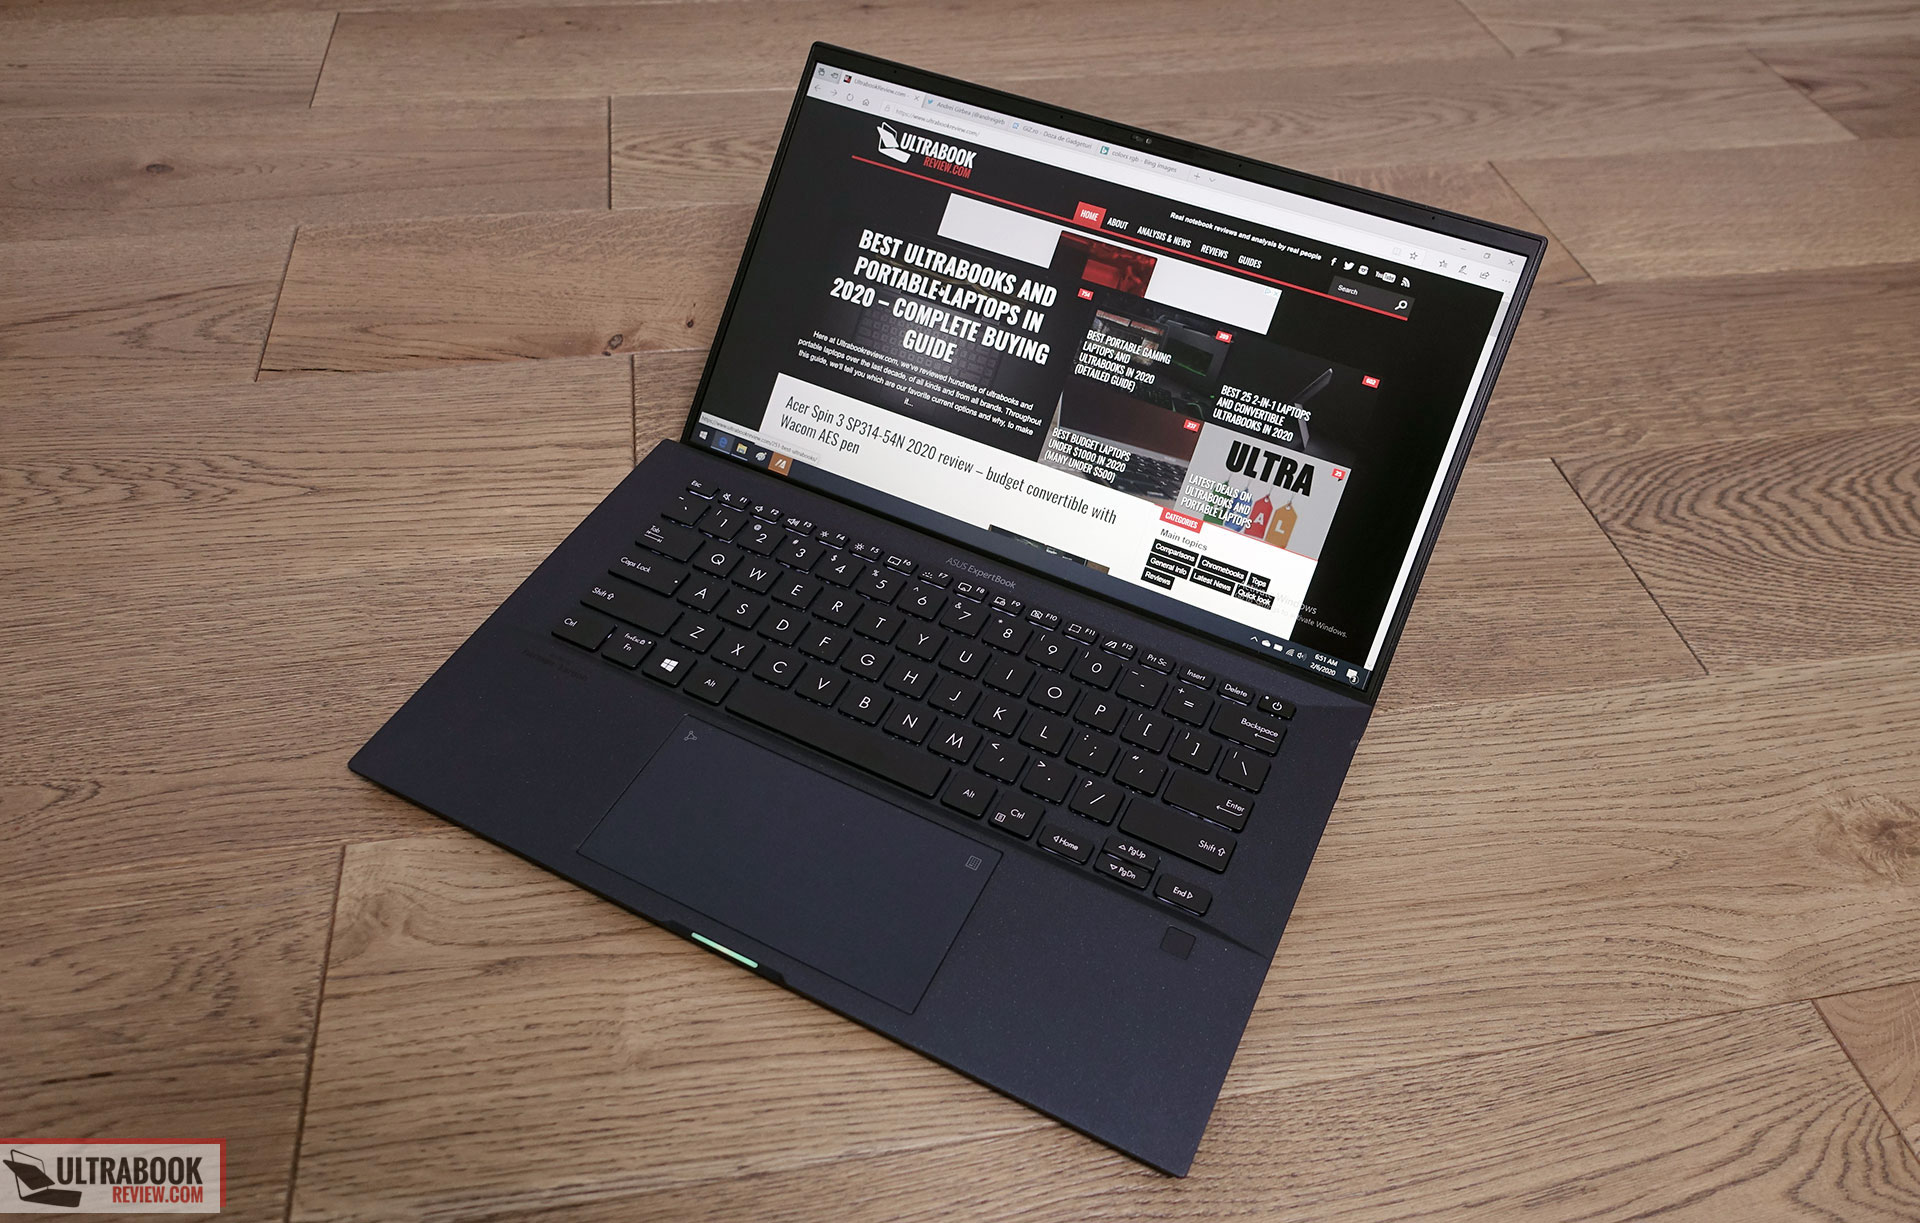 Asus ExpertBook B9450FA - design